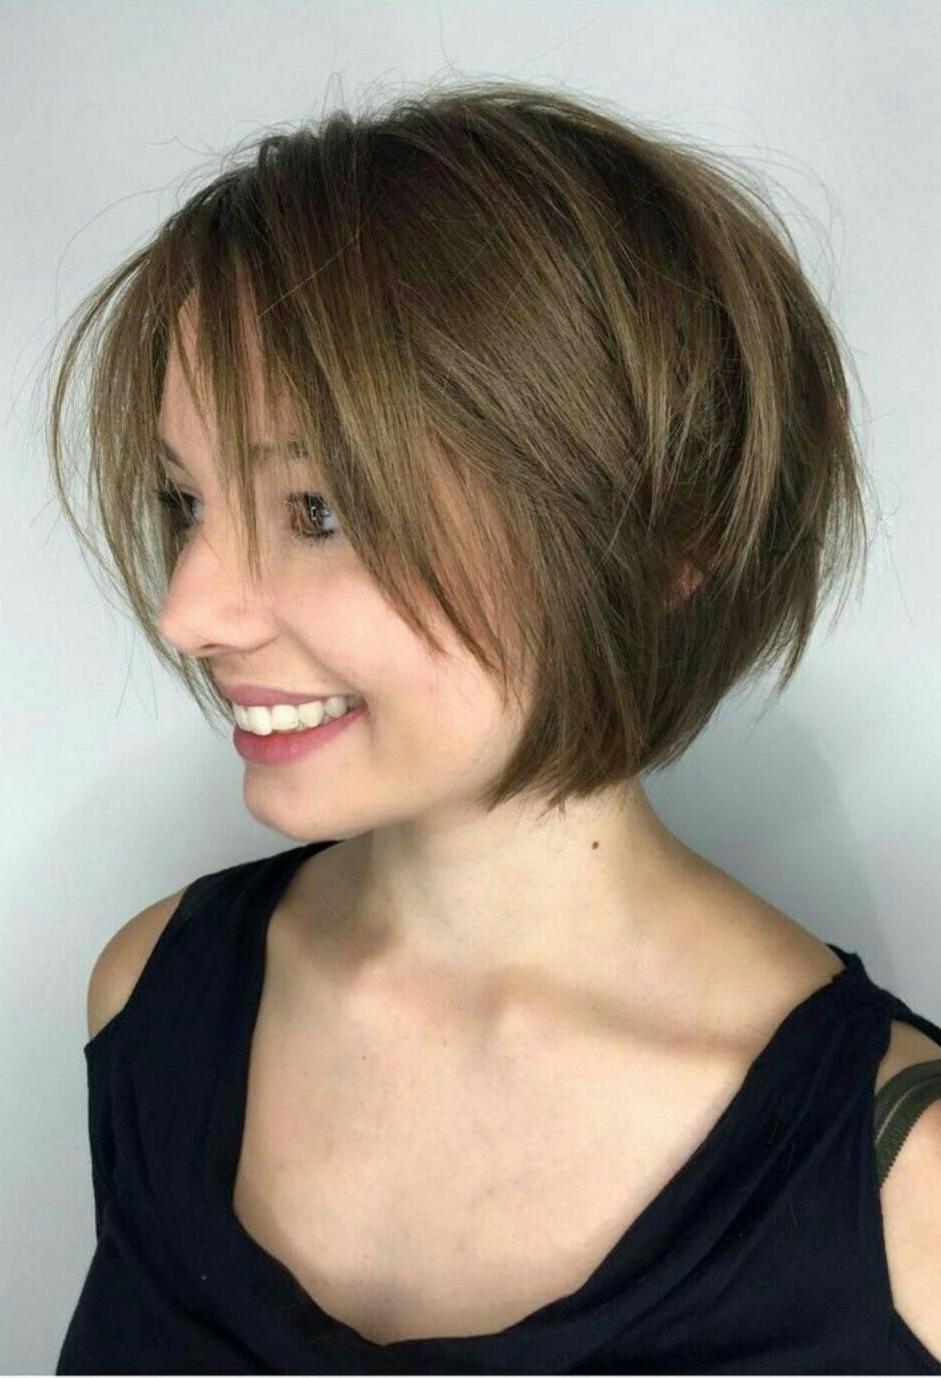 Pinlindsey Rogers On Hair In 2018 | Pinterest | Hair, Hair Inside Choppy Short Hairstyles (View 23 of 25)